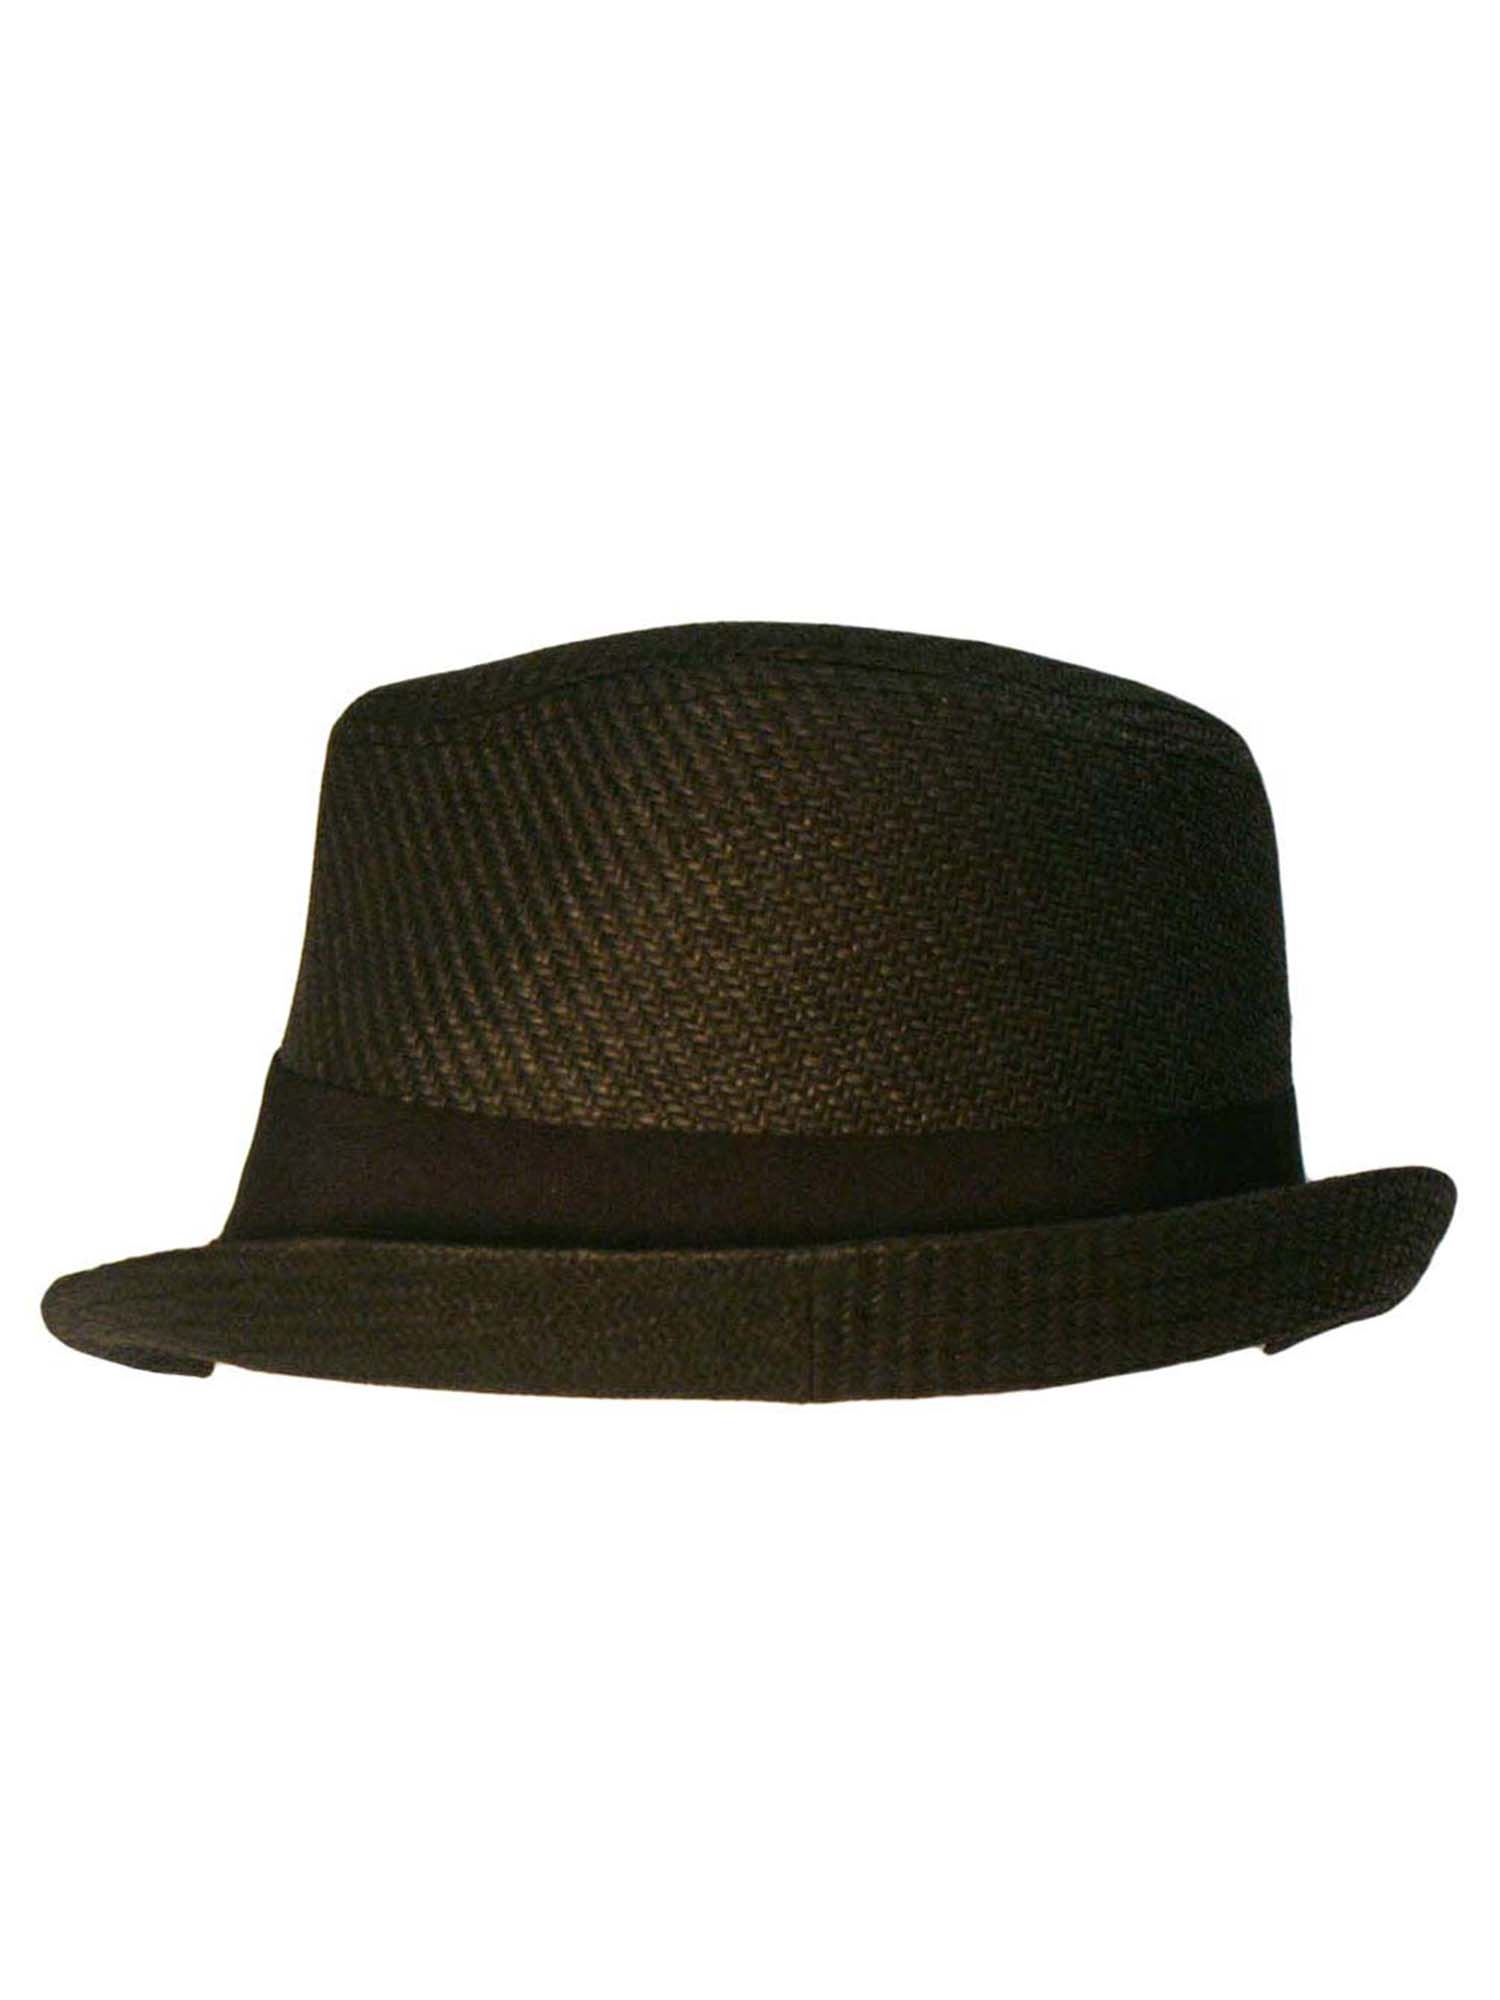 b08c8cf8f193c BLACK FEDORA HAT WITH SLANTED BRIM 706433043965